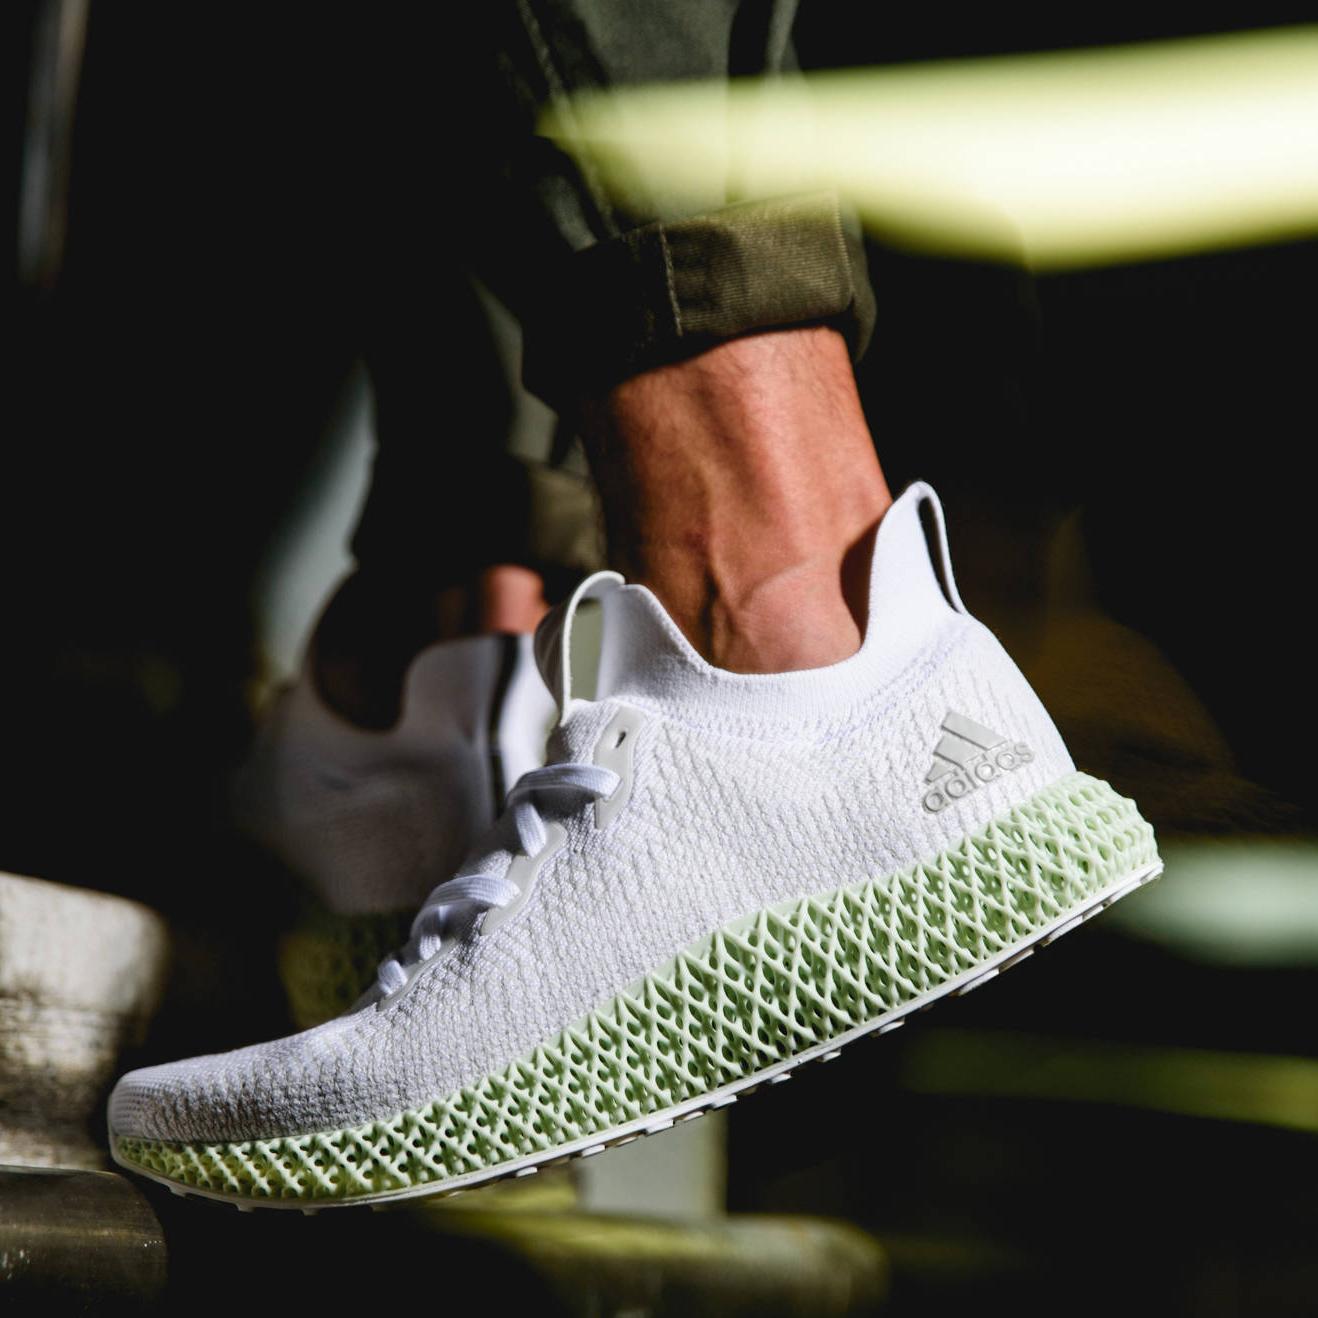 adidas 獨創 4D 科技中底數位化製鞋技術改寫歷史!